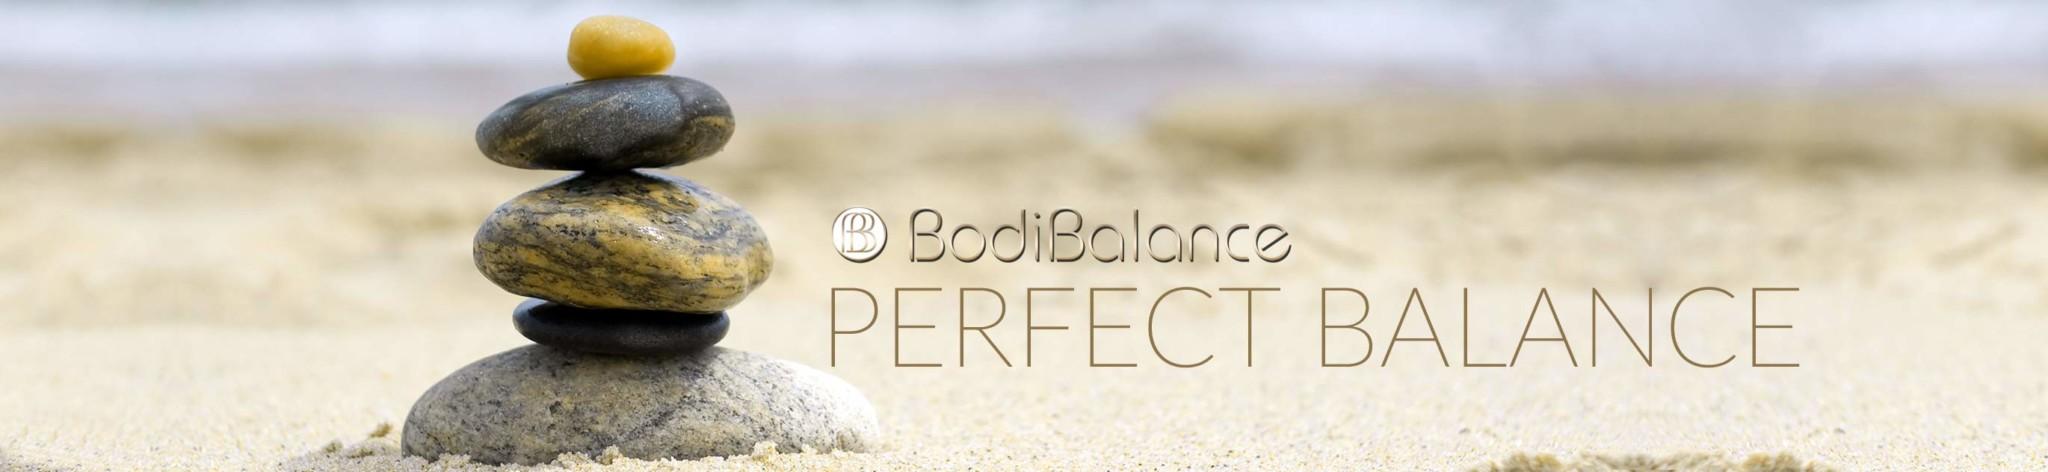 BodiBalance-banner-balance-V2